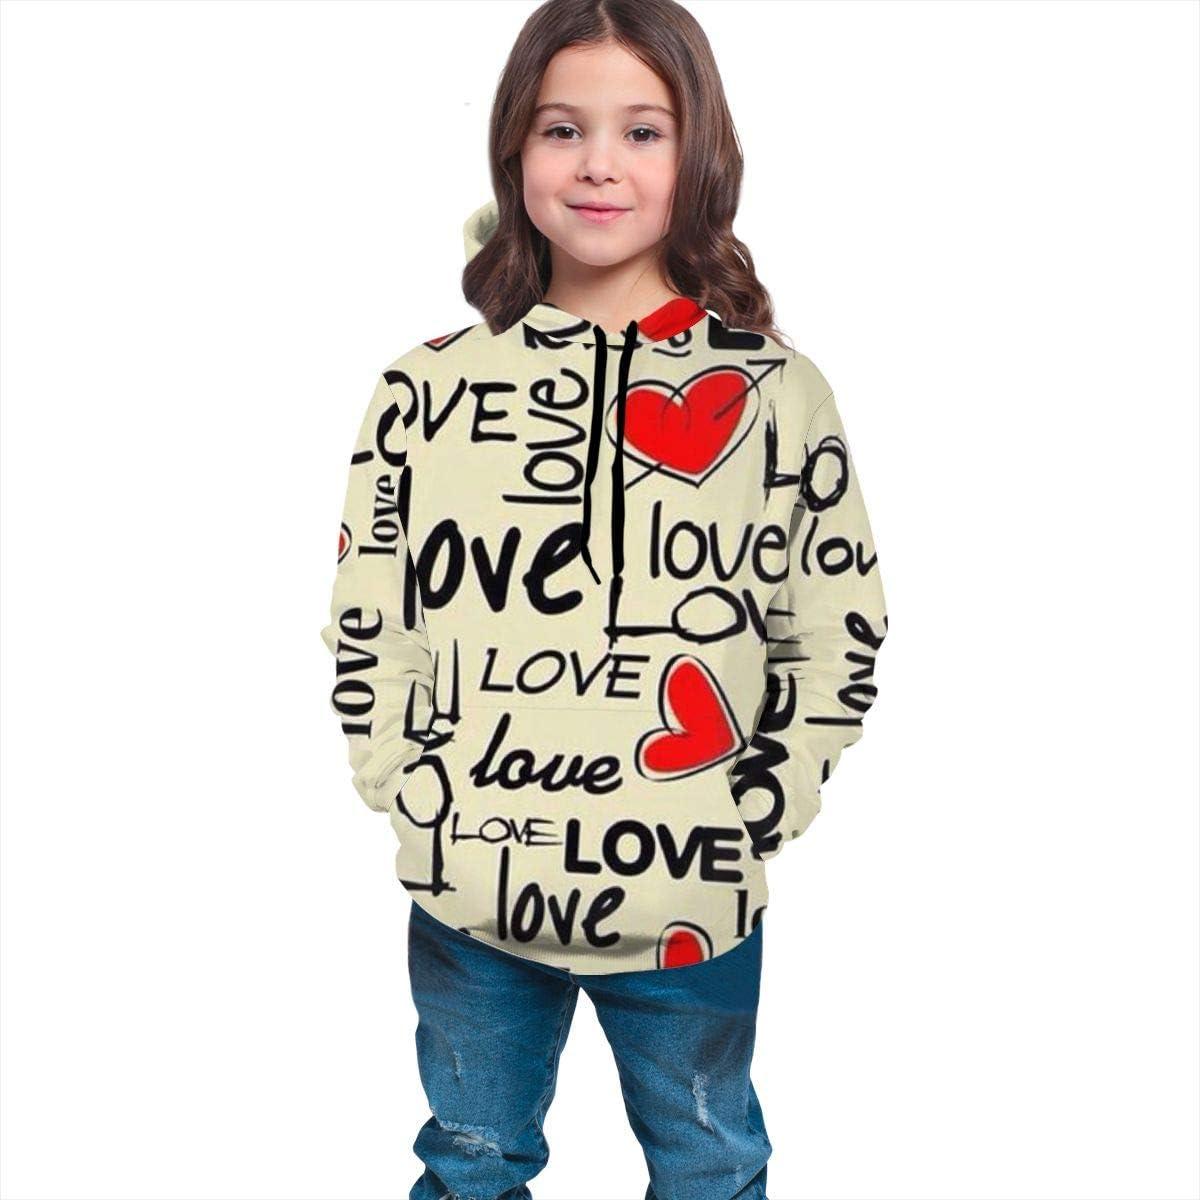 Love with Heart Unisex Pullover Teens Hoodie Hooded Sweatshirt Colorful